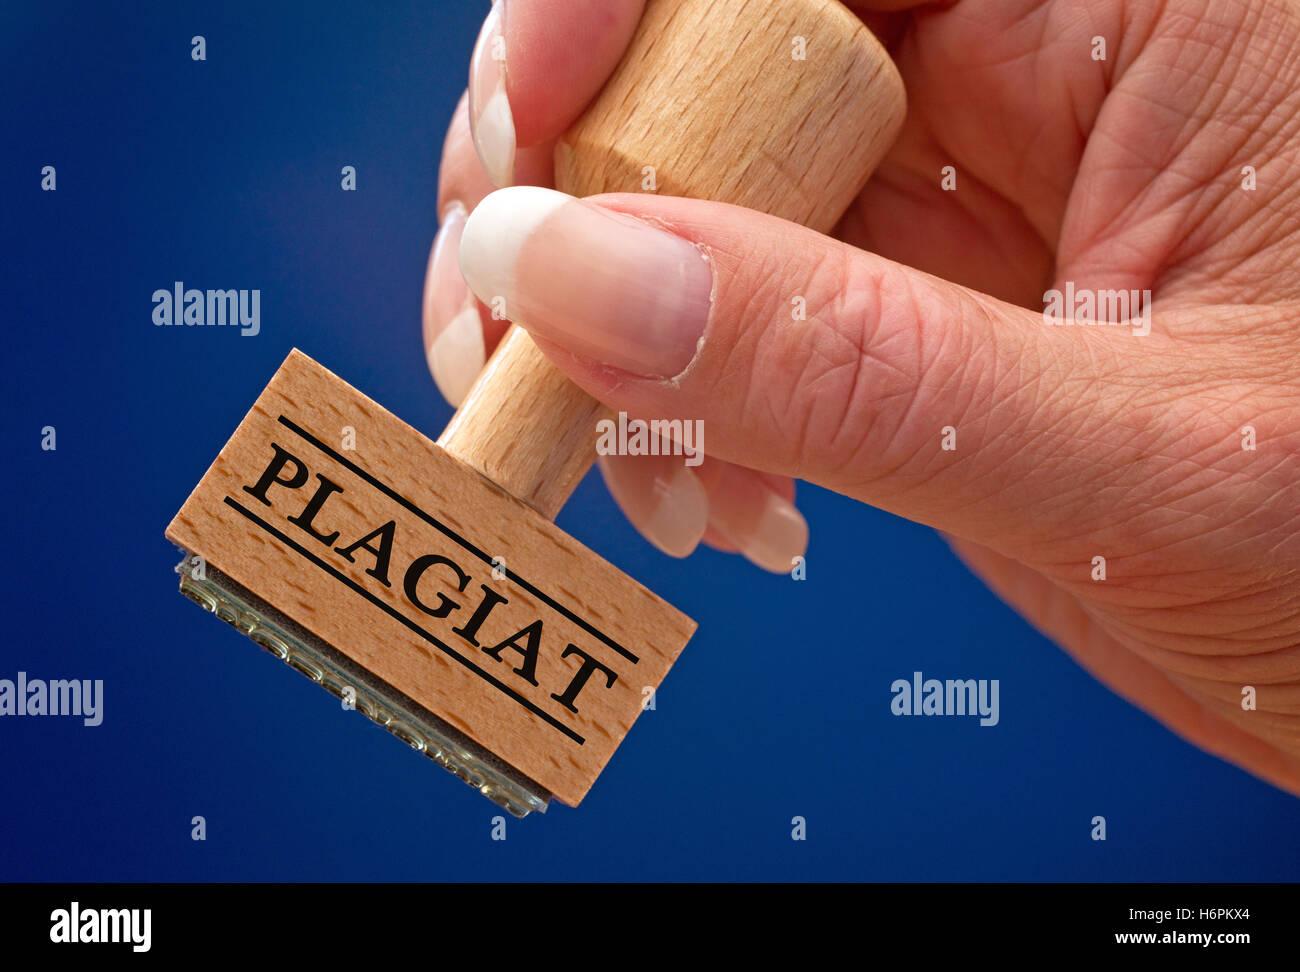 plagiarism - stempel mit hand - Stock Image